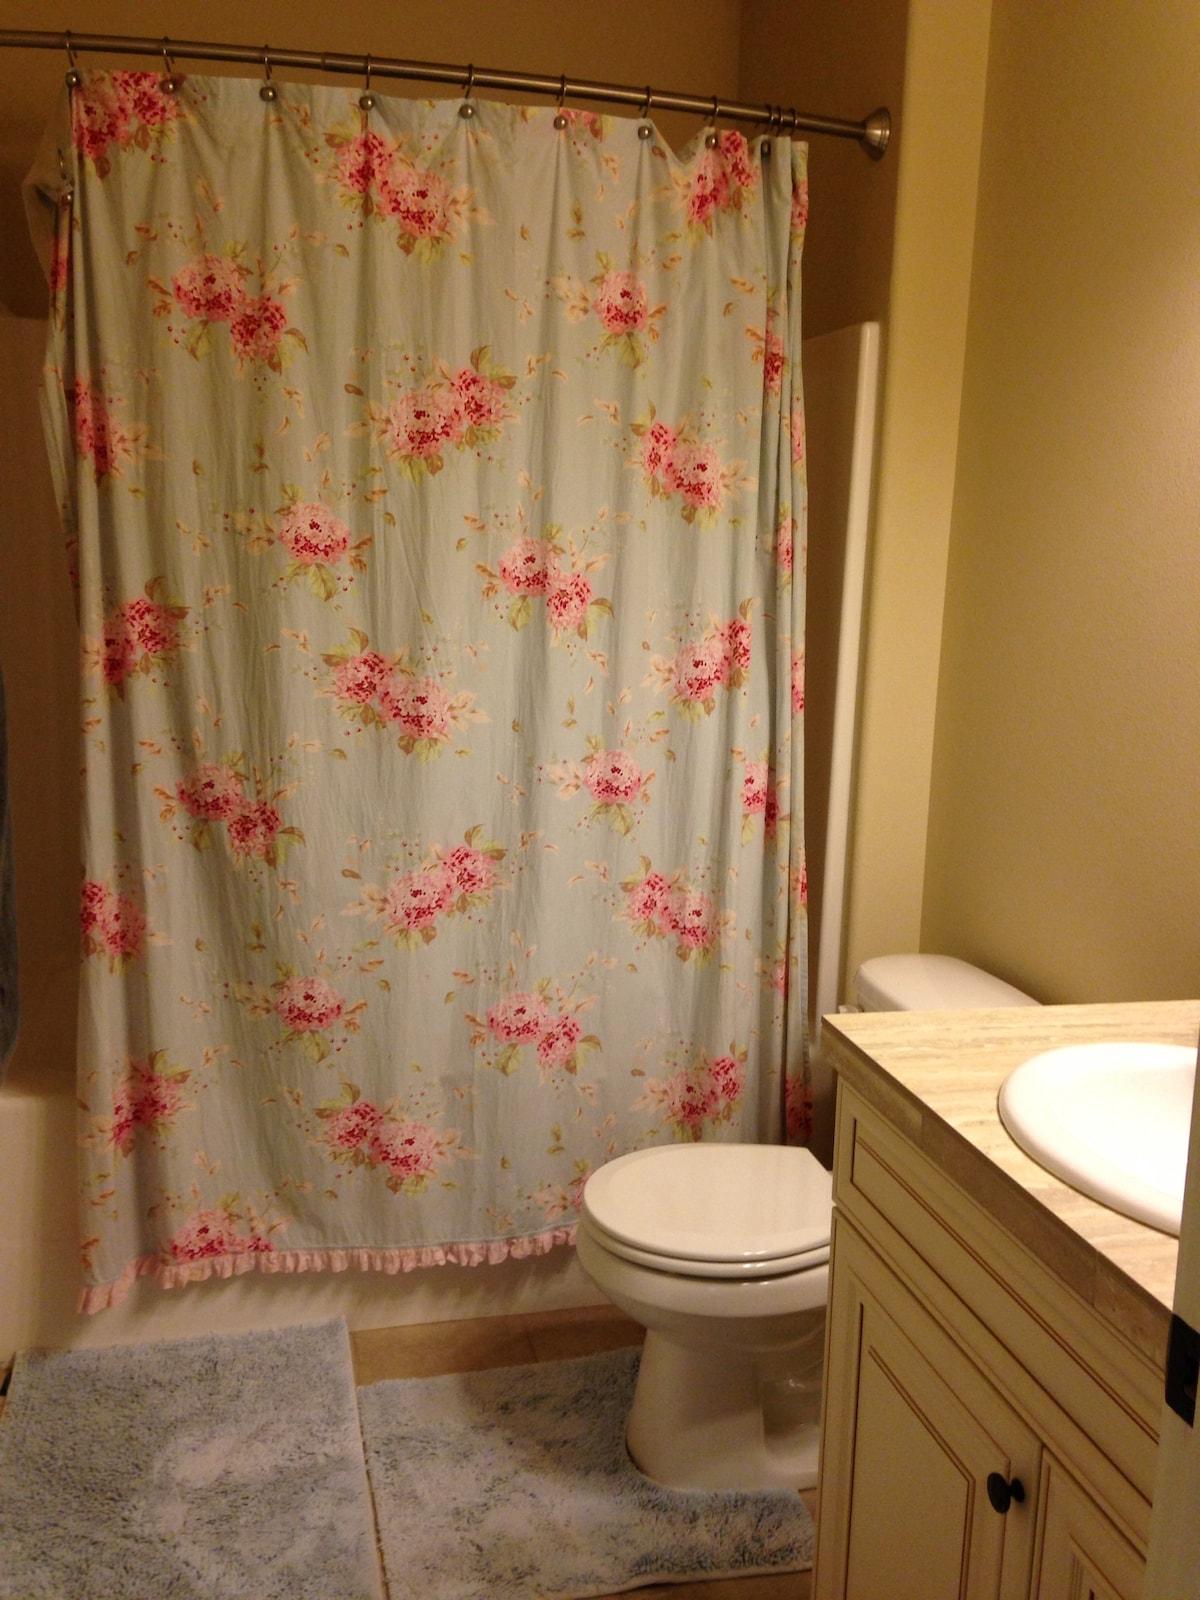 Bathroom with a large soaking tub